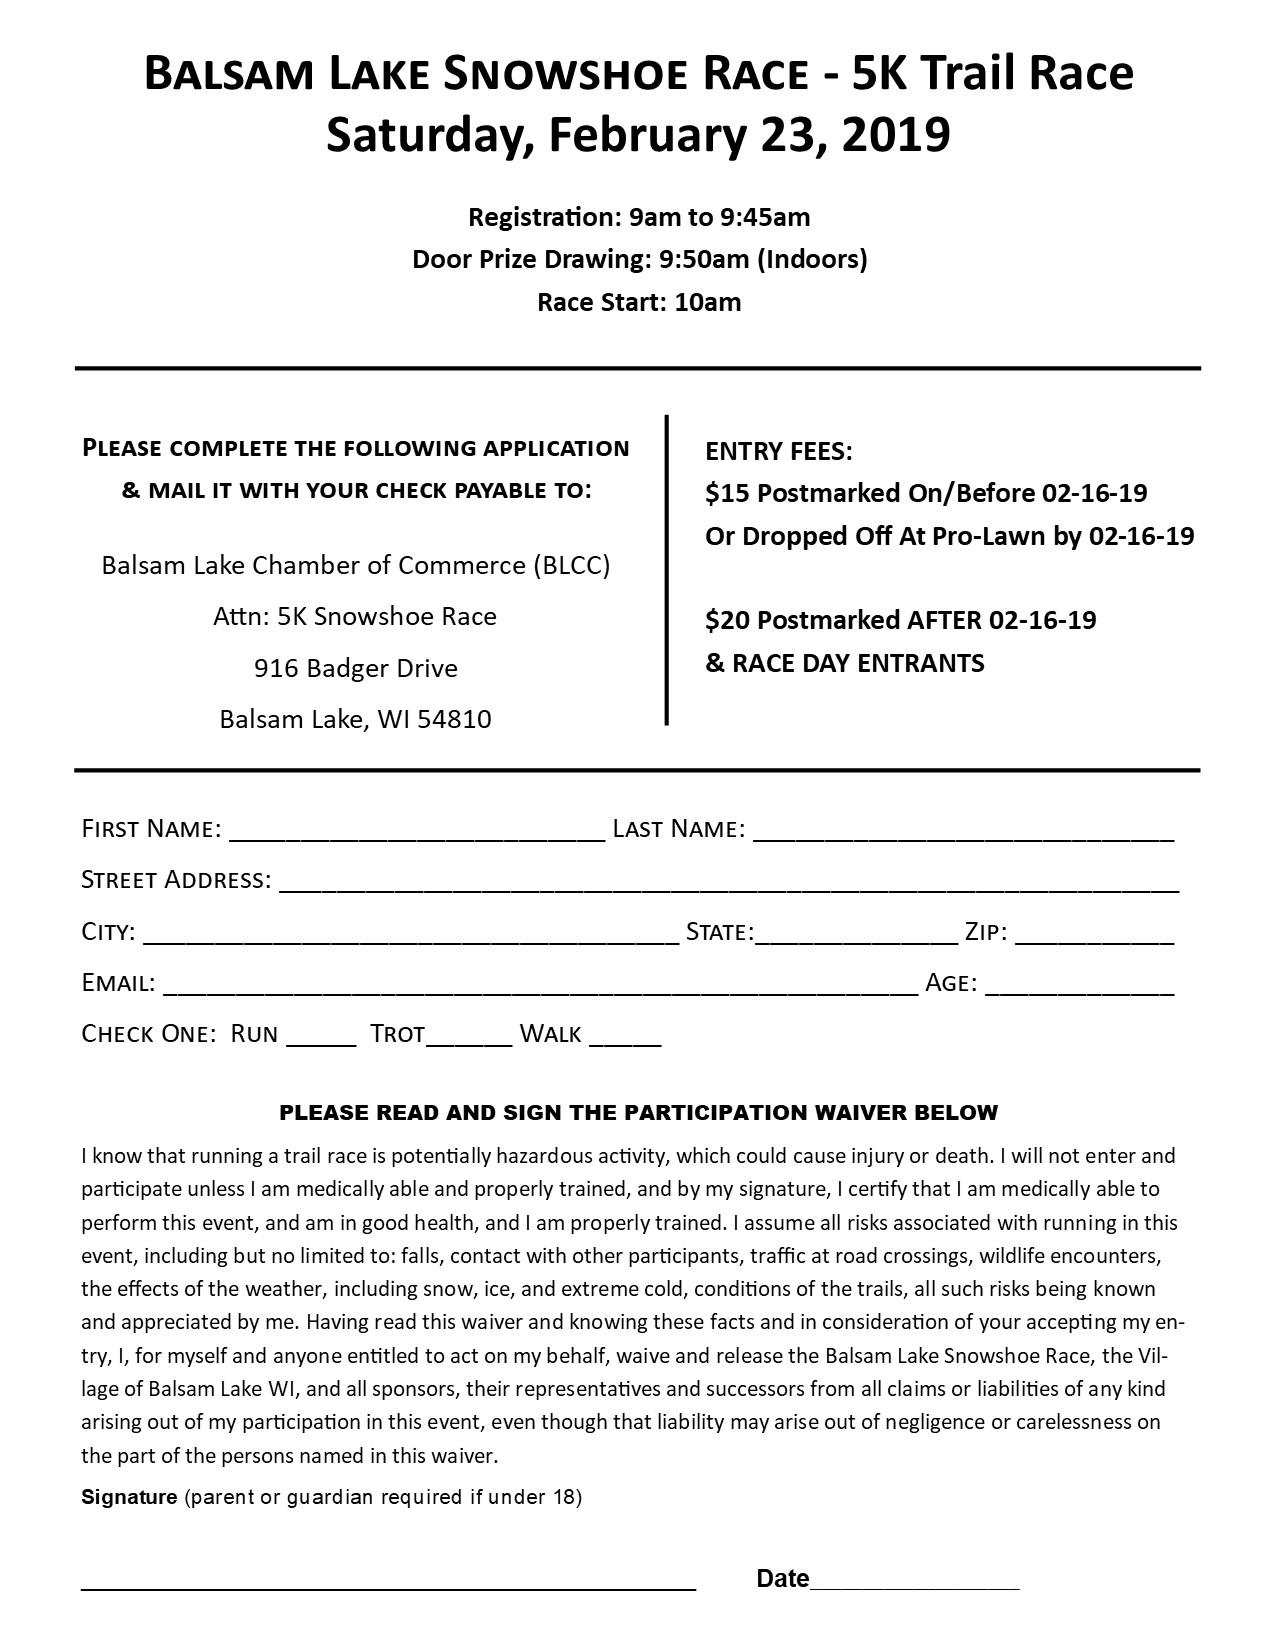 Balsam Lake Snowshoe Race Registration Form